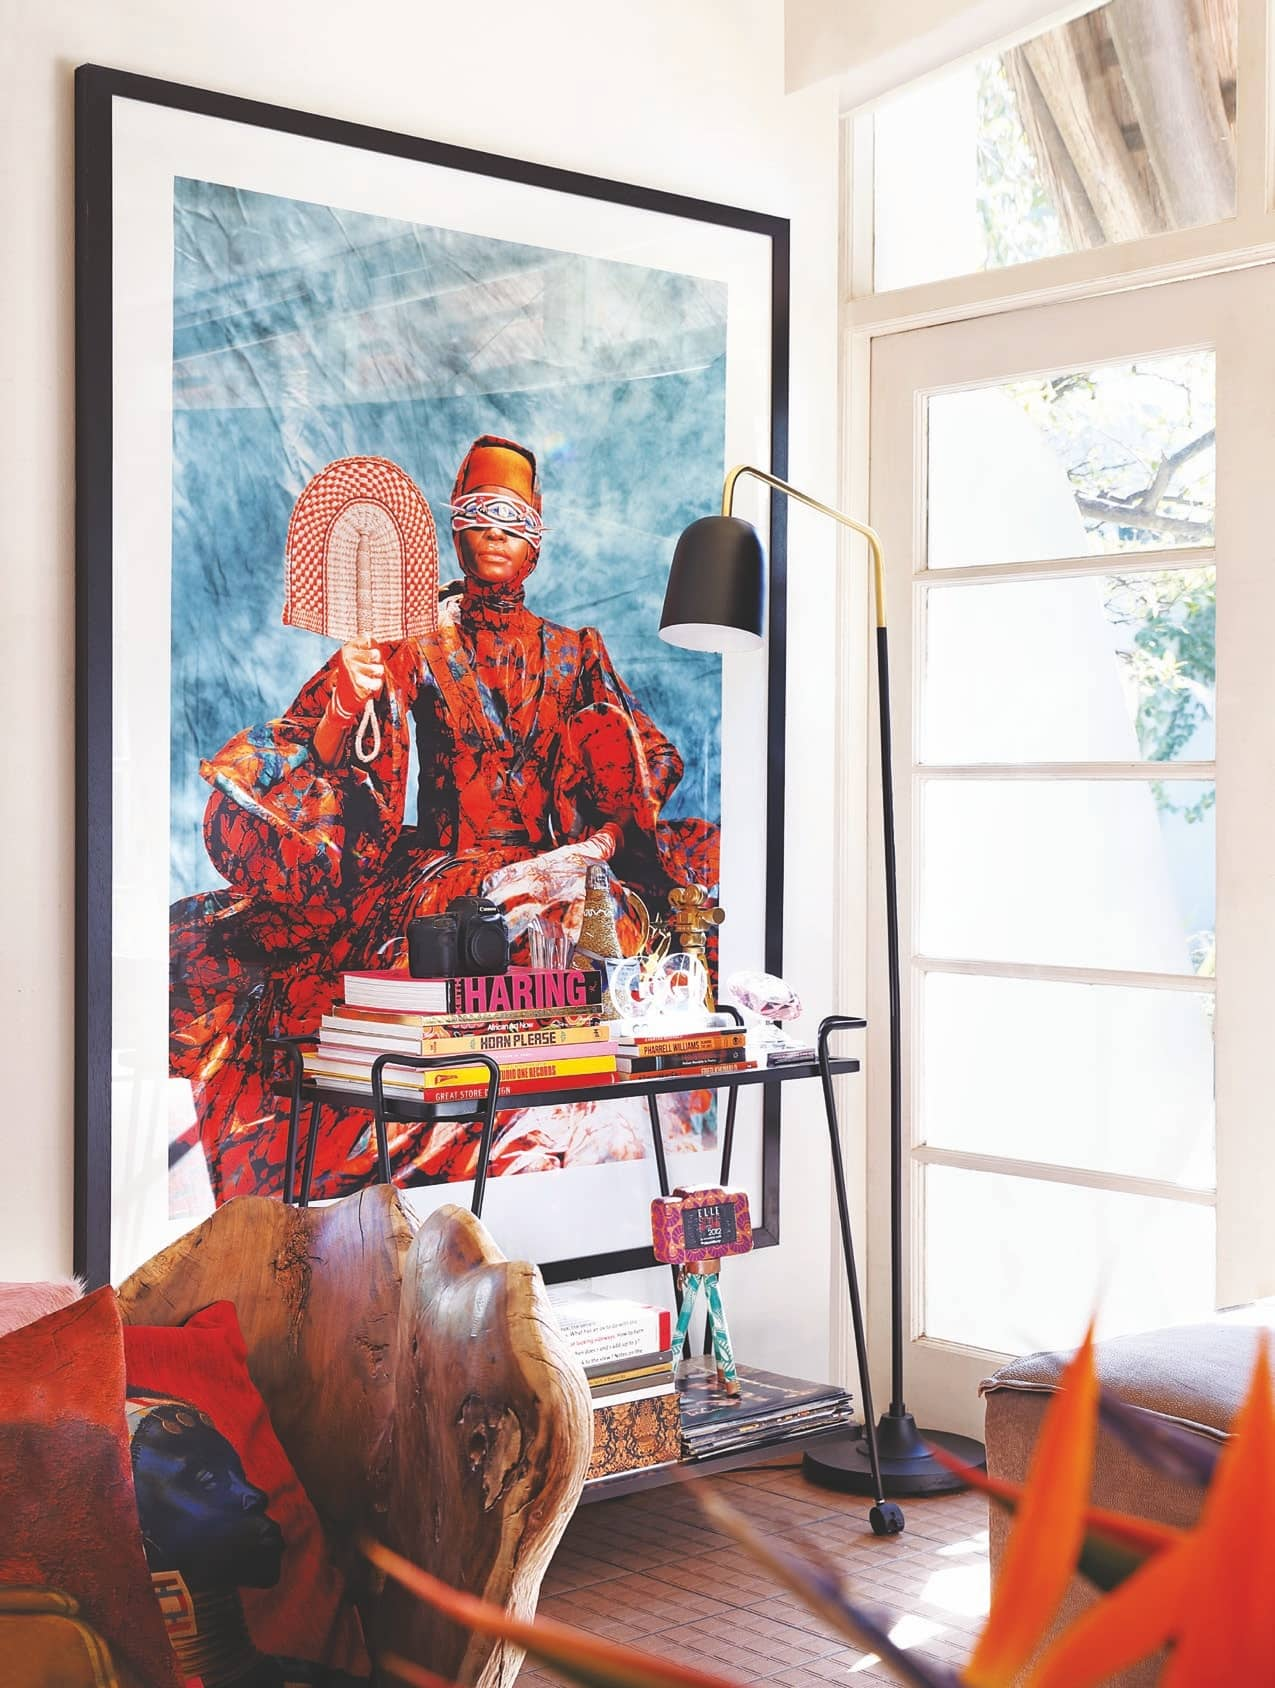 Trevor Stuurman's Style Snapshot